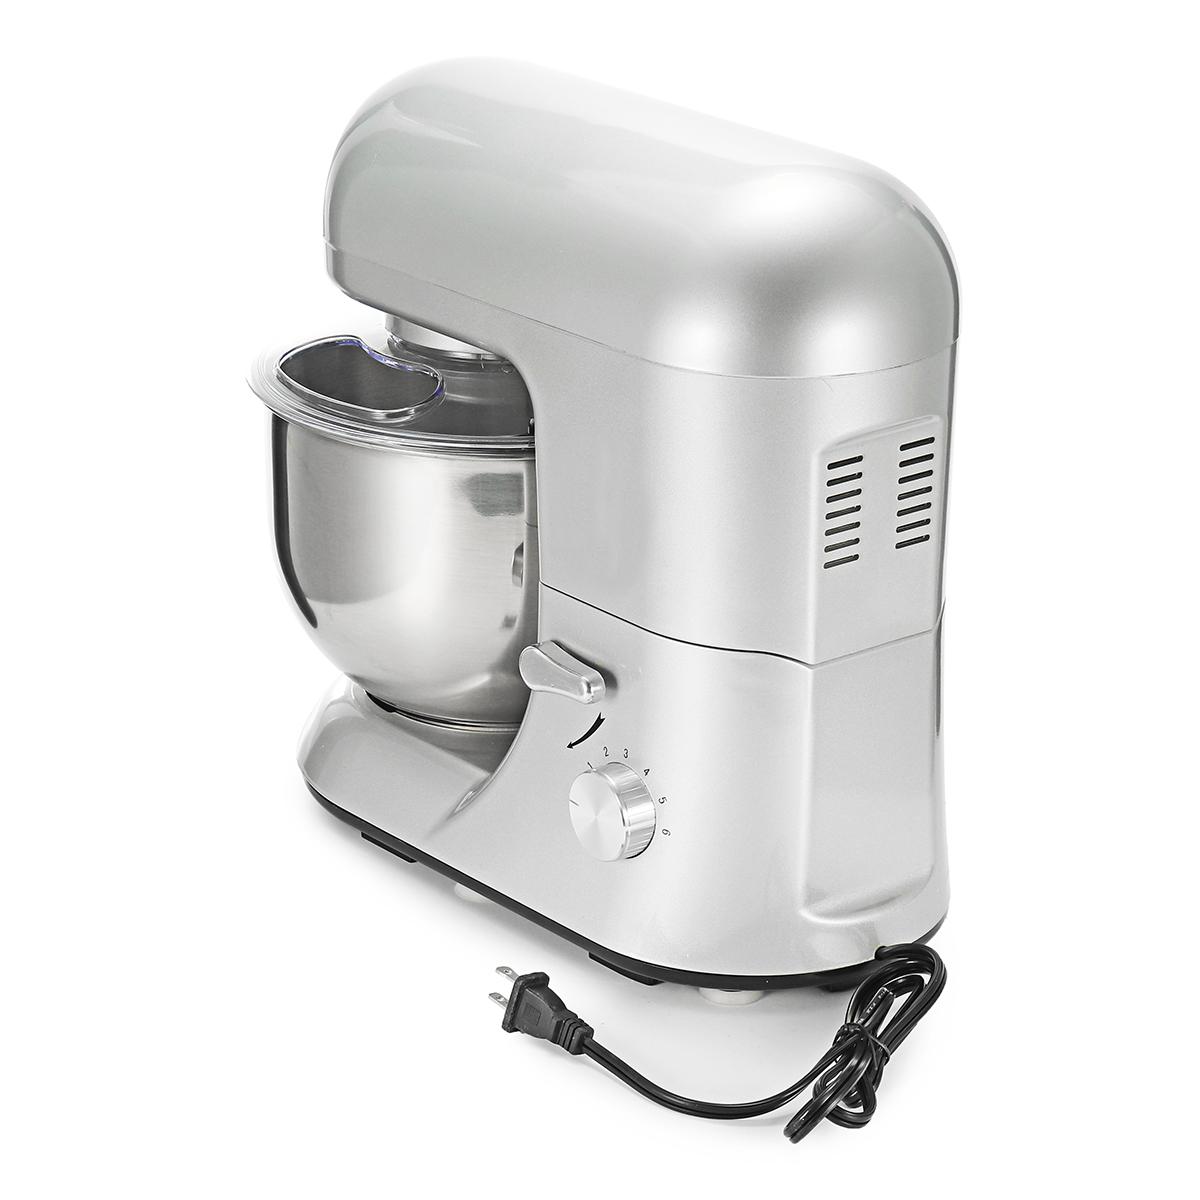 1200W Stand Mixer Blender Kitchen Machine Kneading Food Processor 5L Bowl Planetar